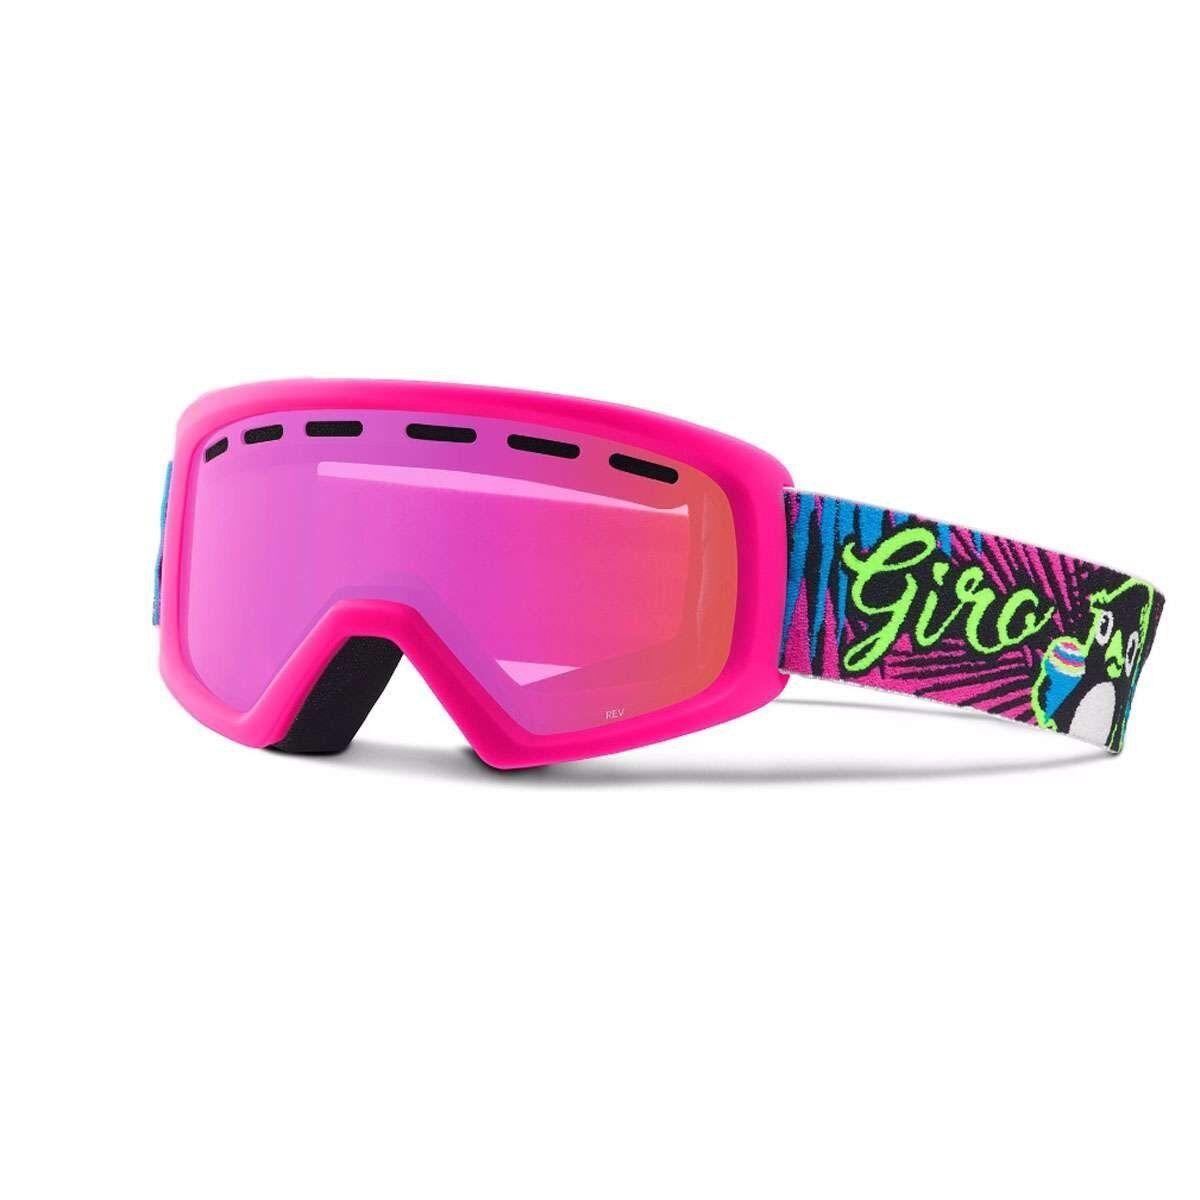 Giro REV Kinderskibrille 6-10 Jahre Penguin Pop/Amber Pink UVP €49,95